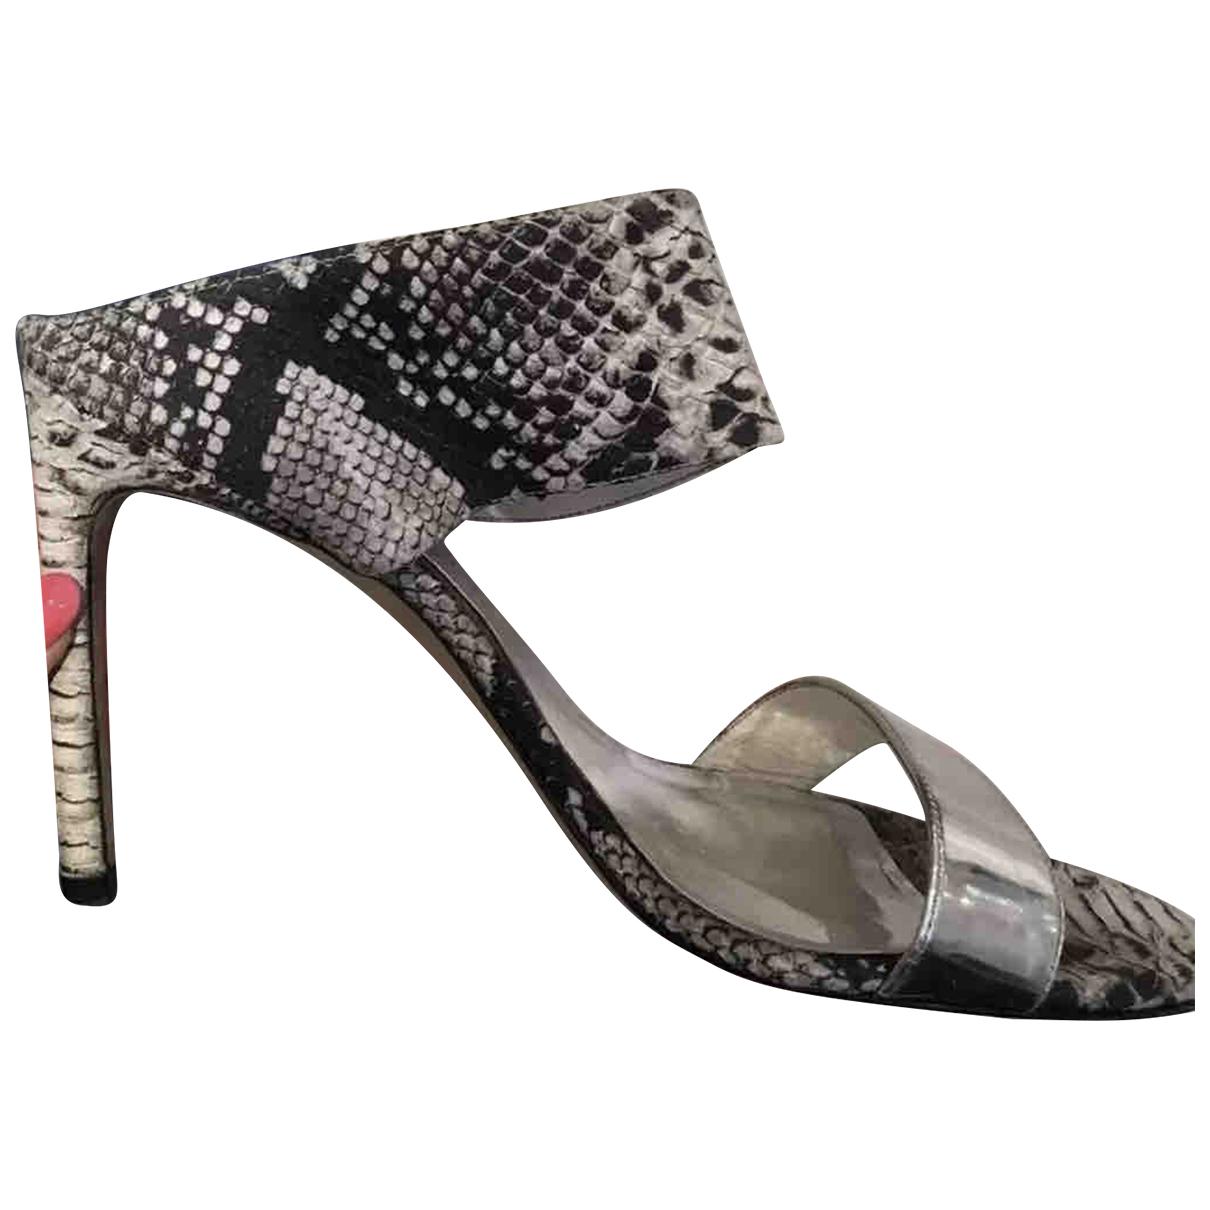 Stuart Weitzman N Multicolour Leather Heels for Women 7 UK